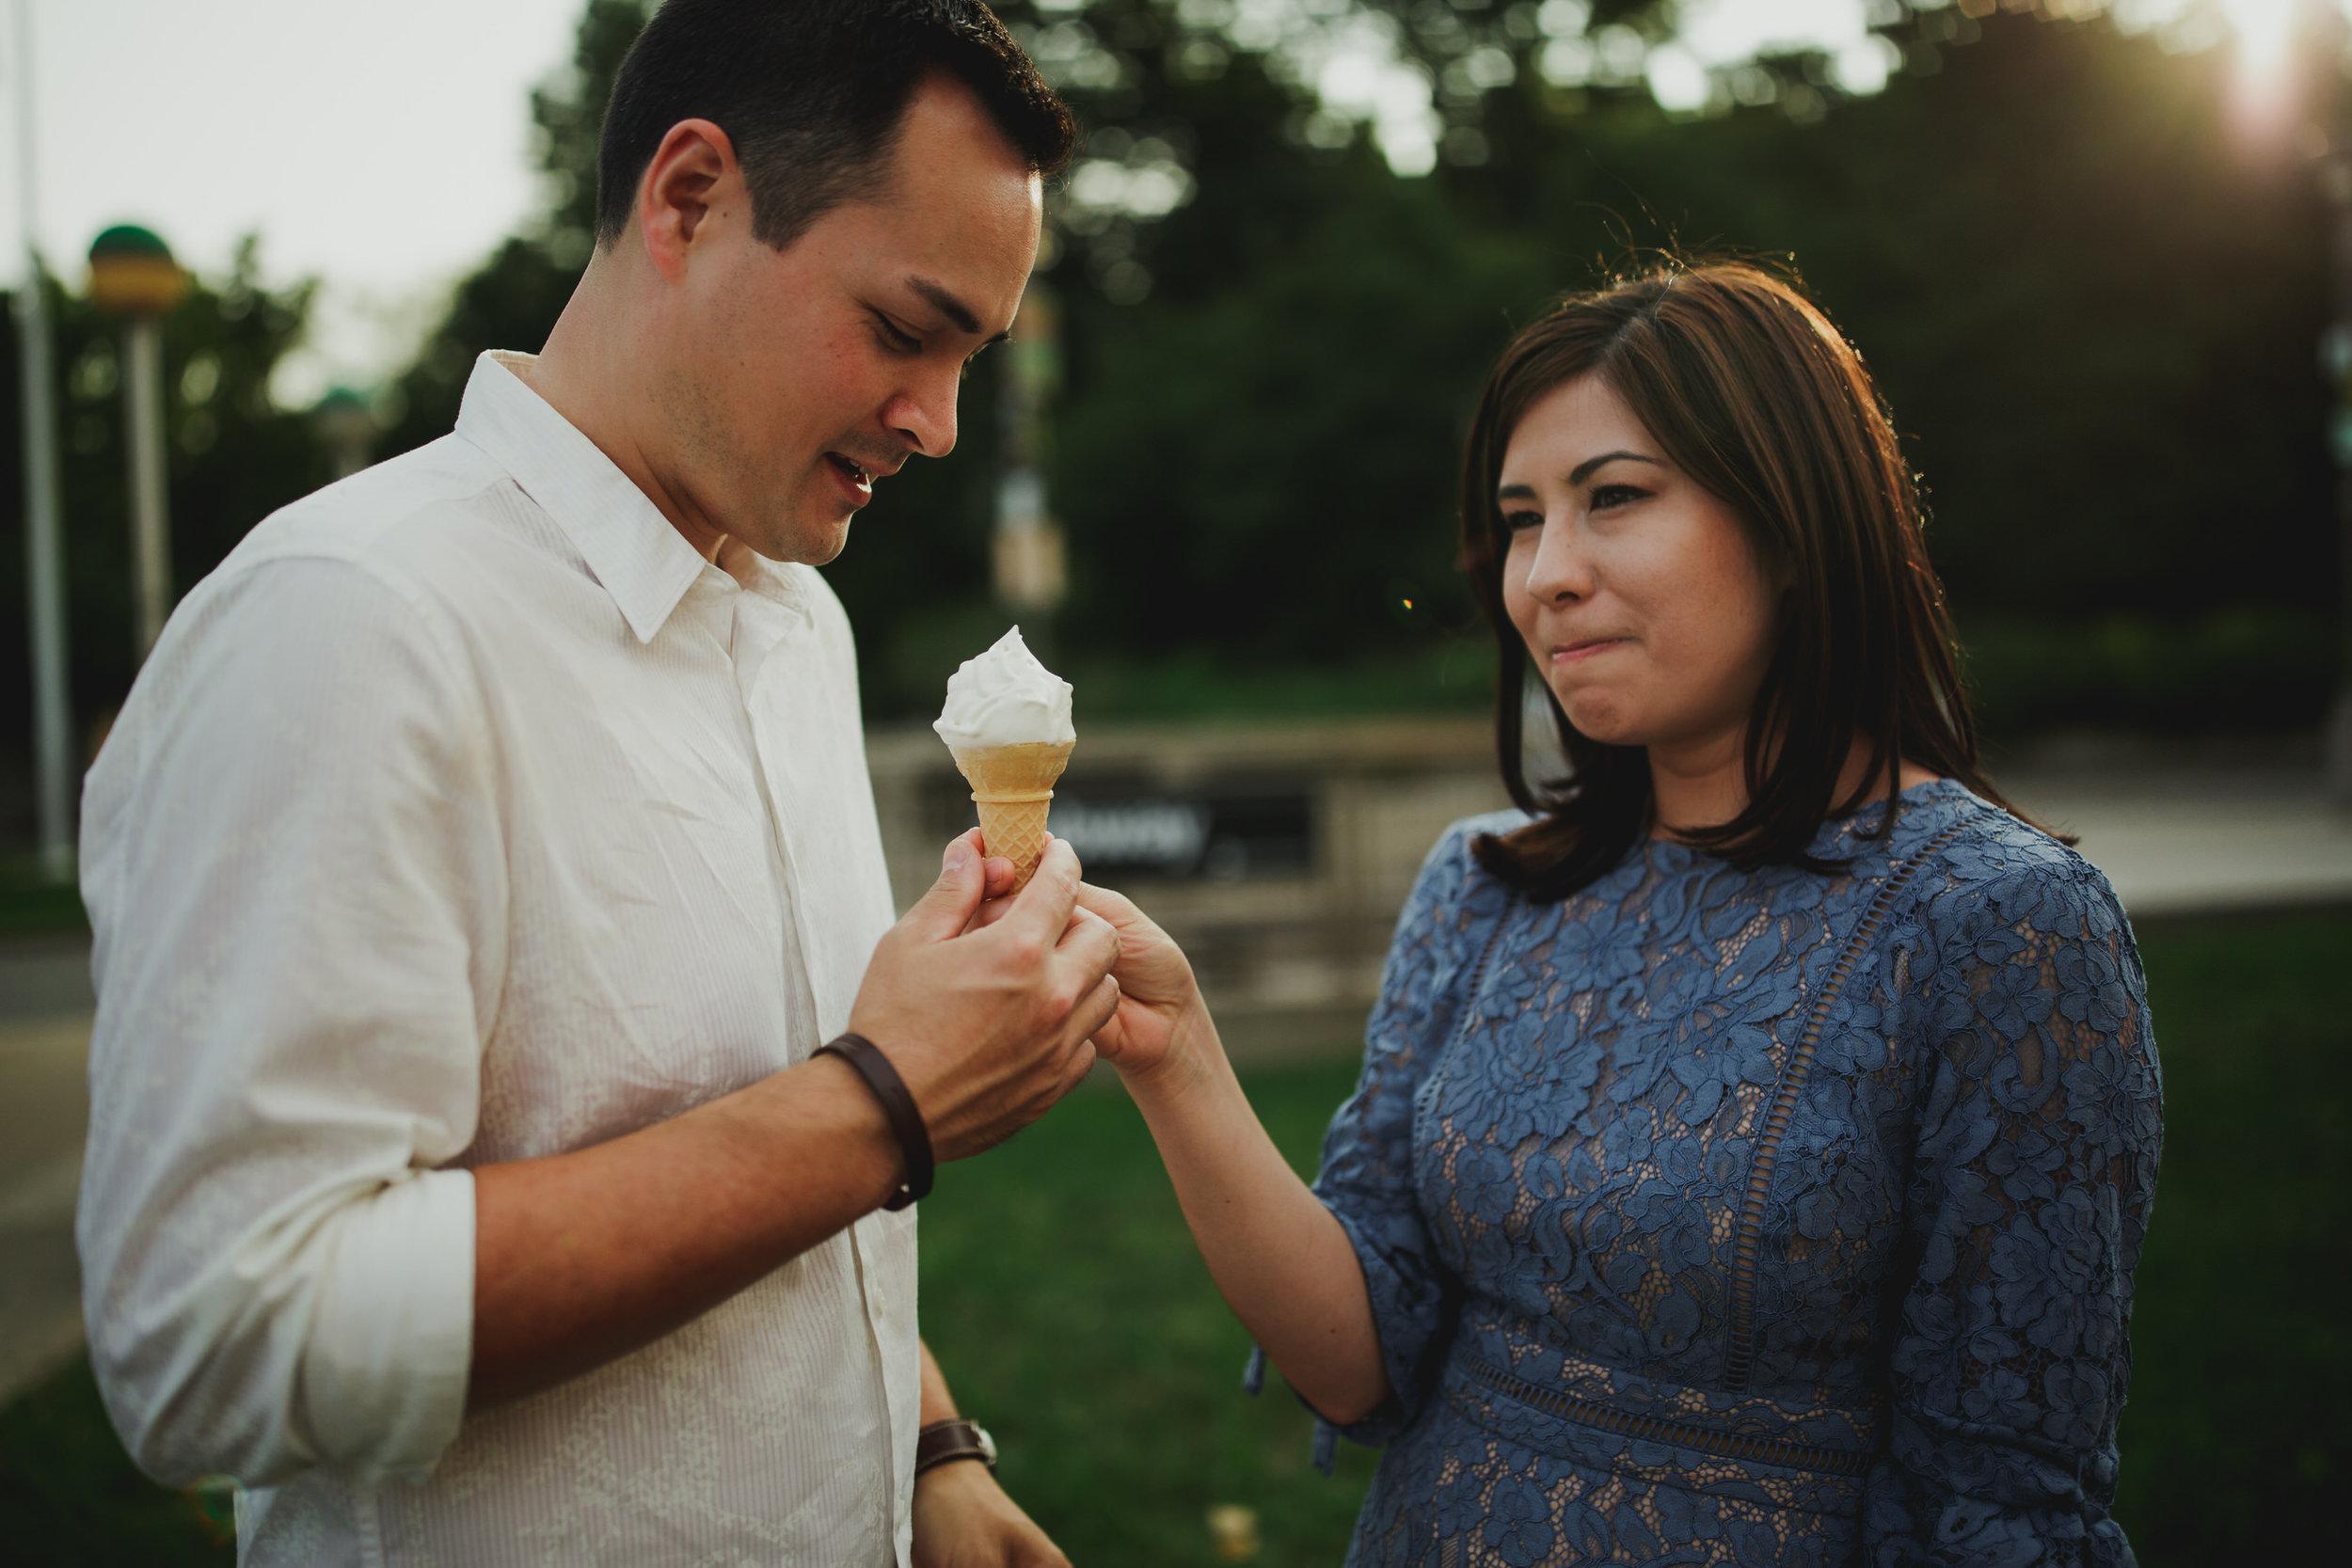 couple_eating_ice_cream_tiny_house_photo_engagement_documentary_photos.jpg